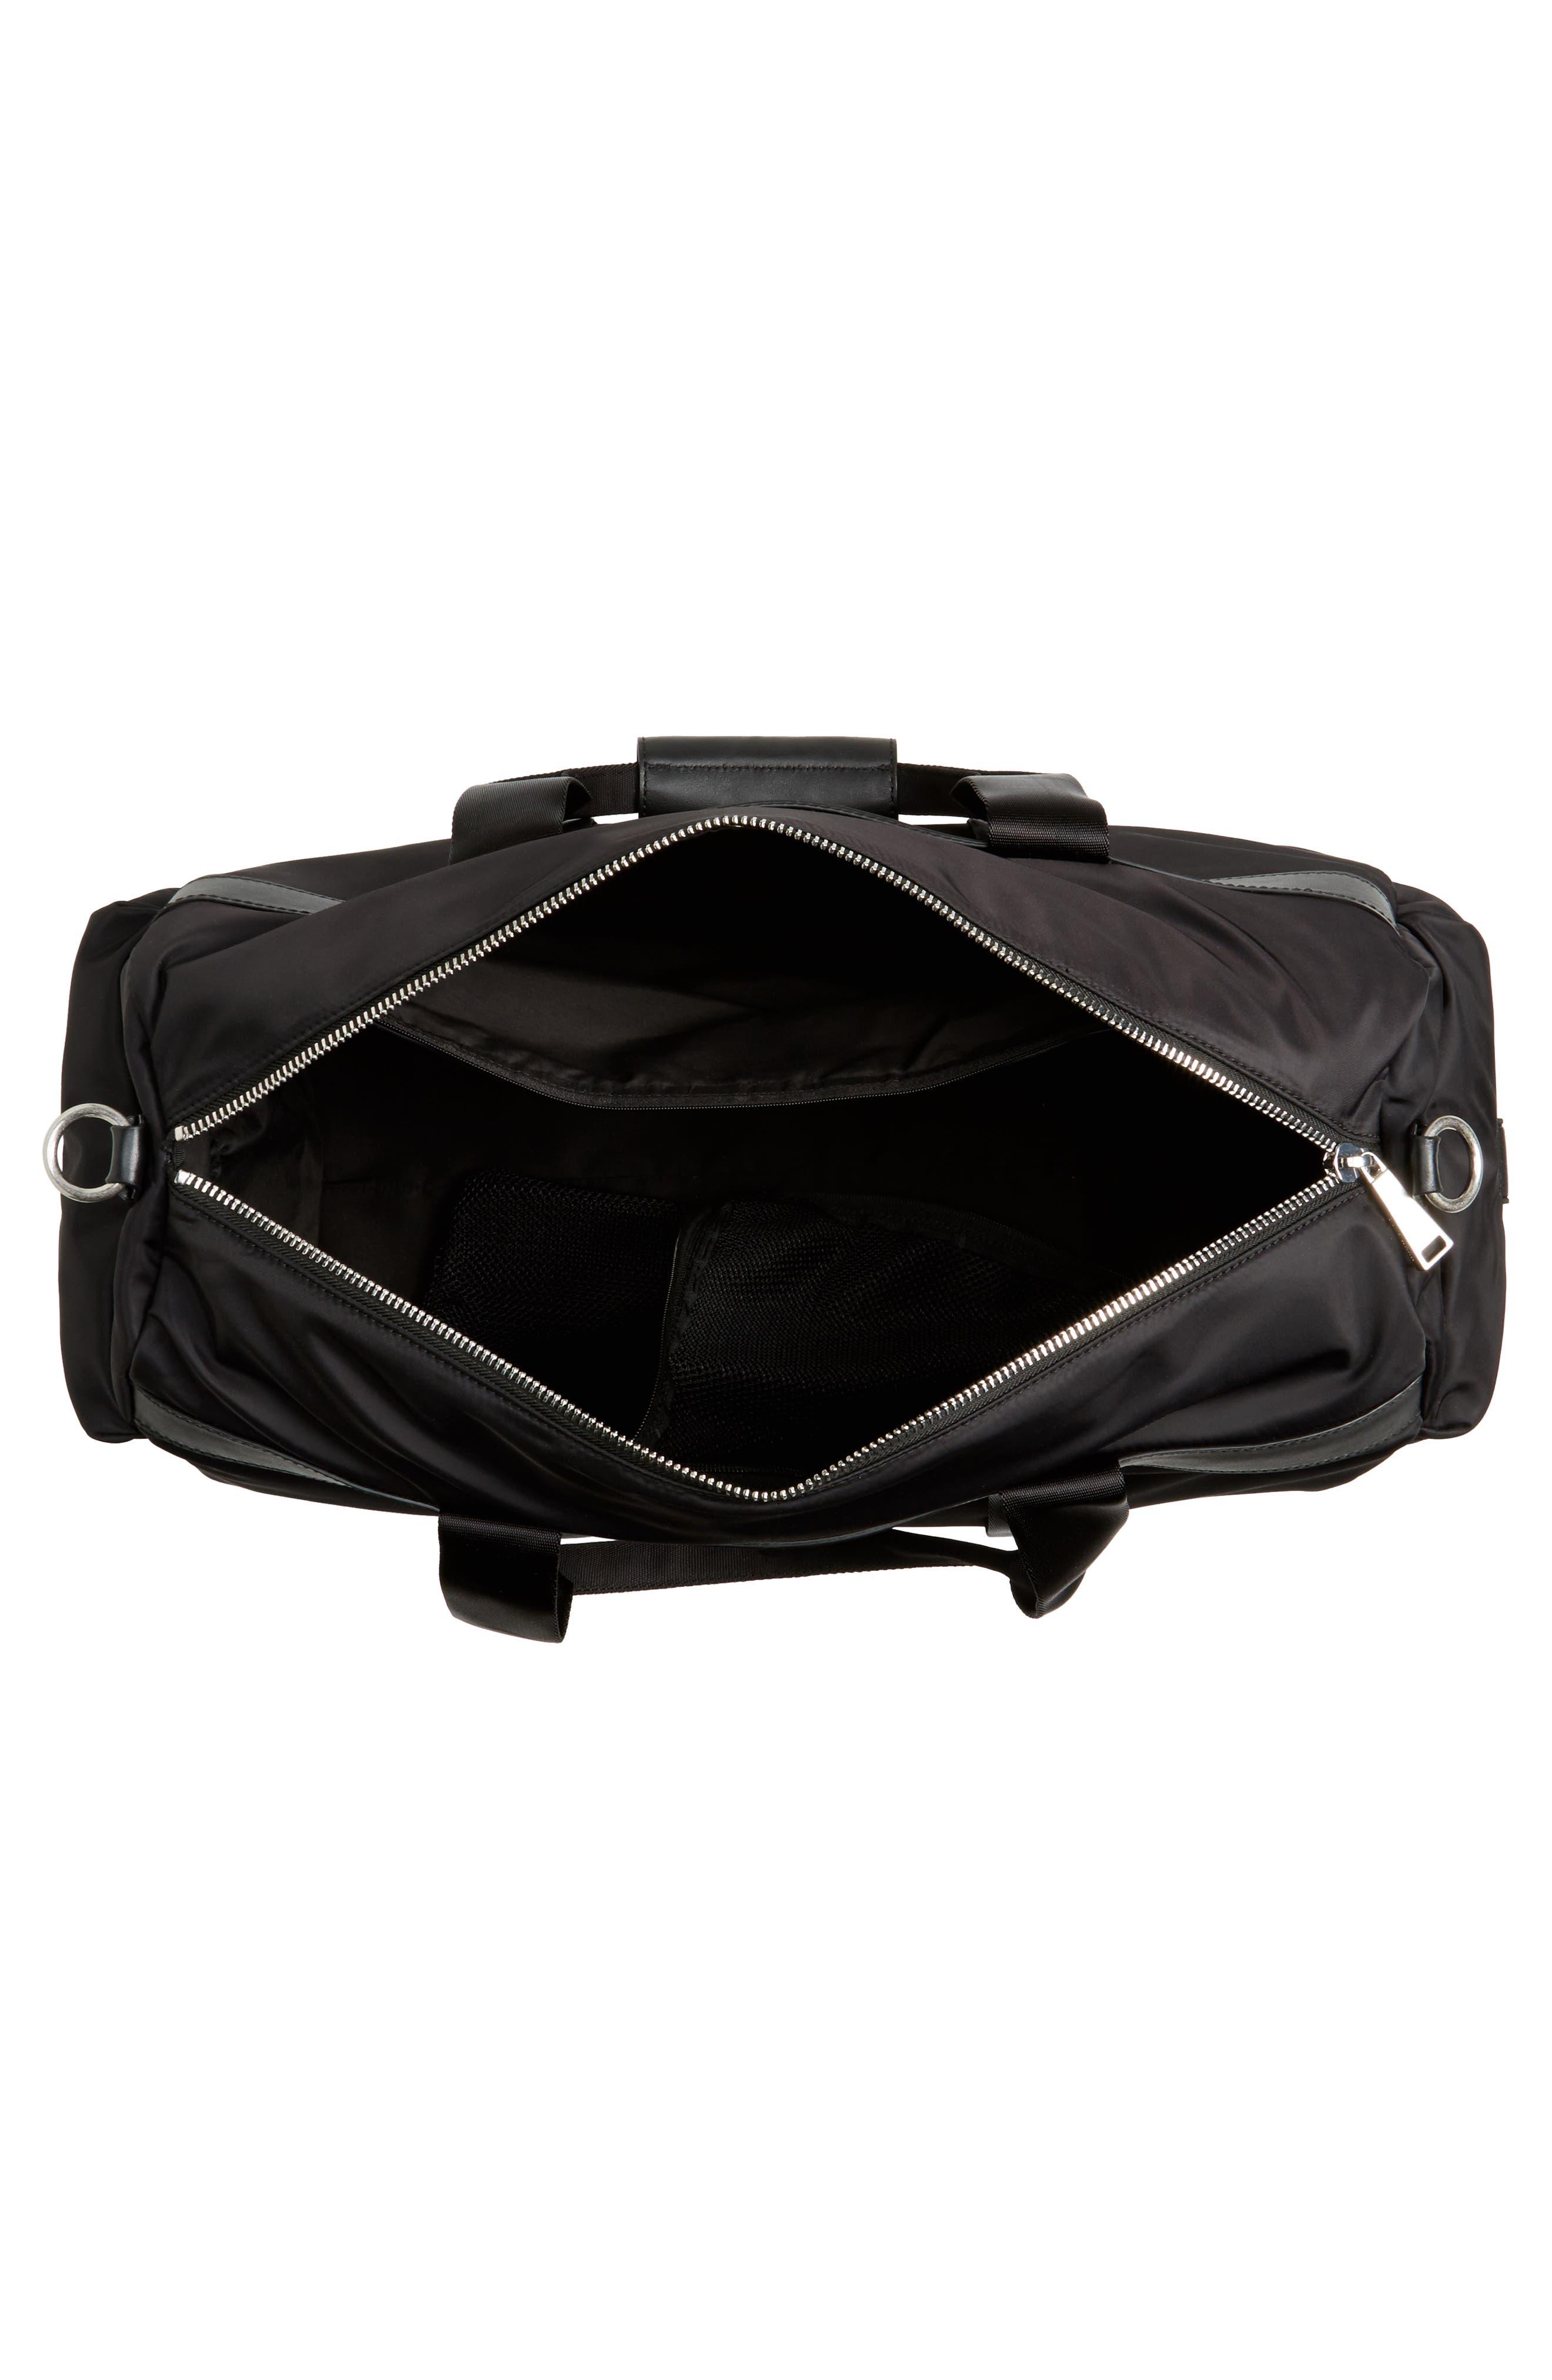 Washington Grand City Duffel Bag,                             Alternate thumbnail 4, color,                             Black